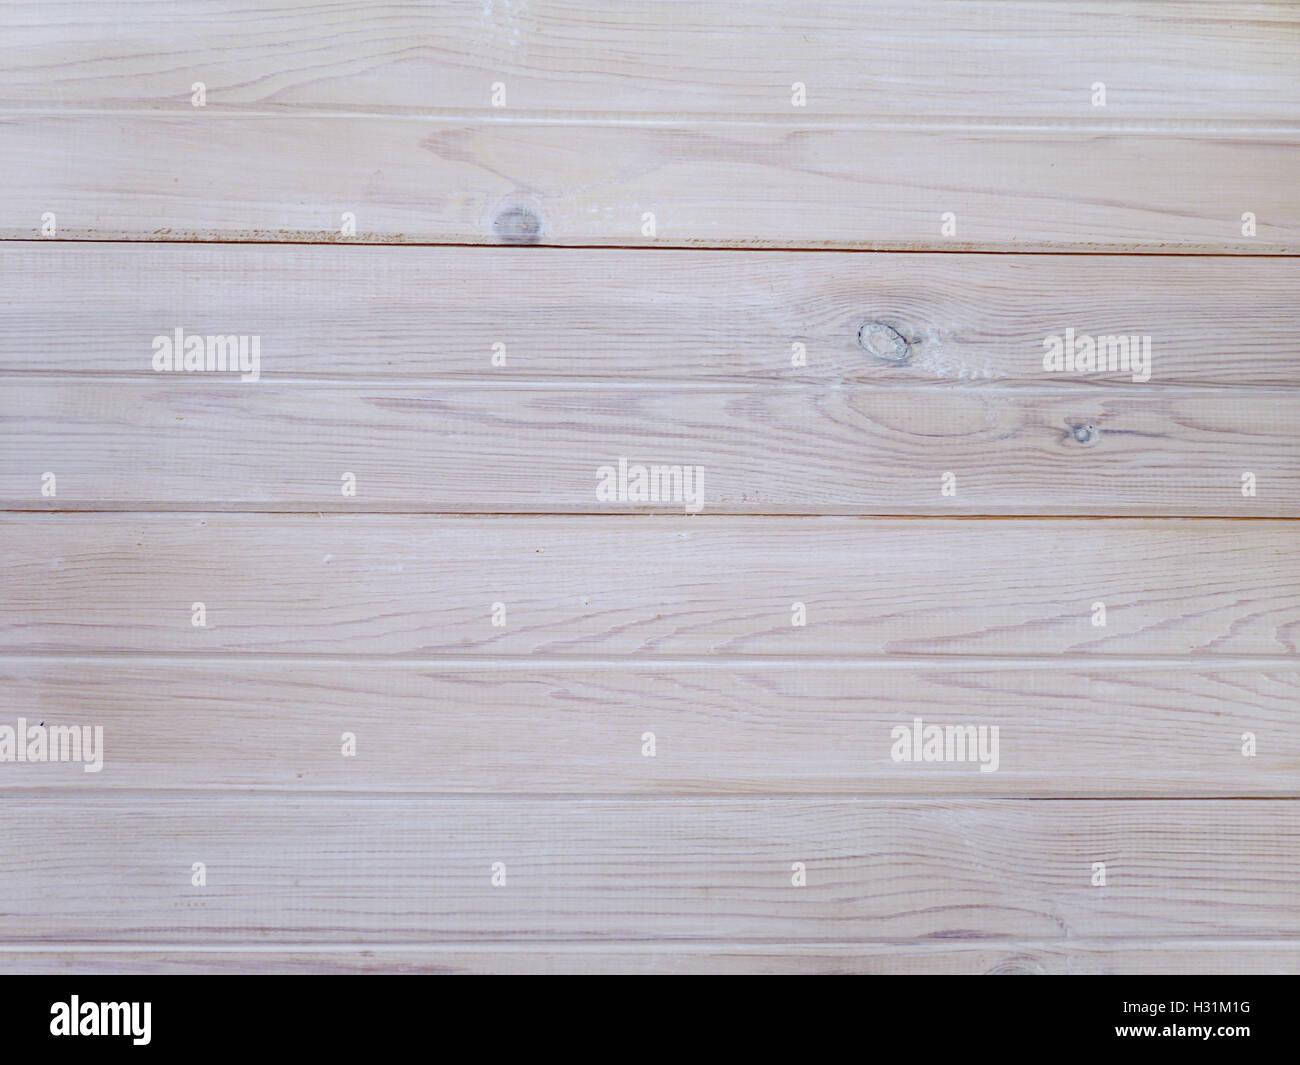 White planks background - Stock Image